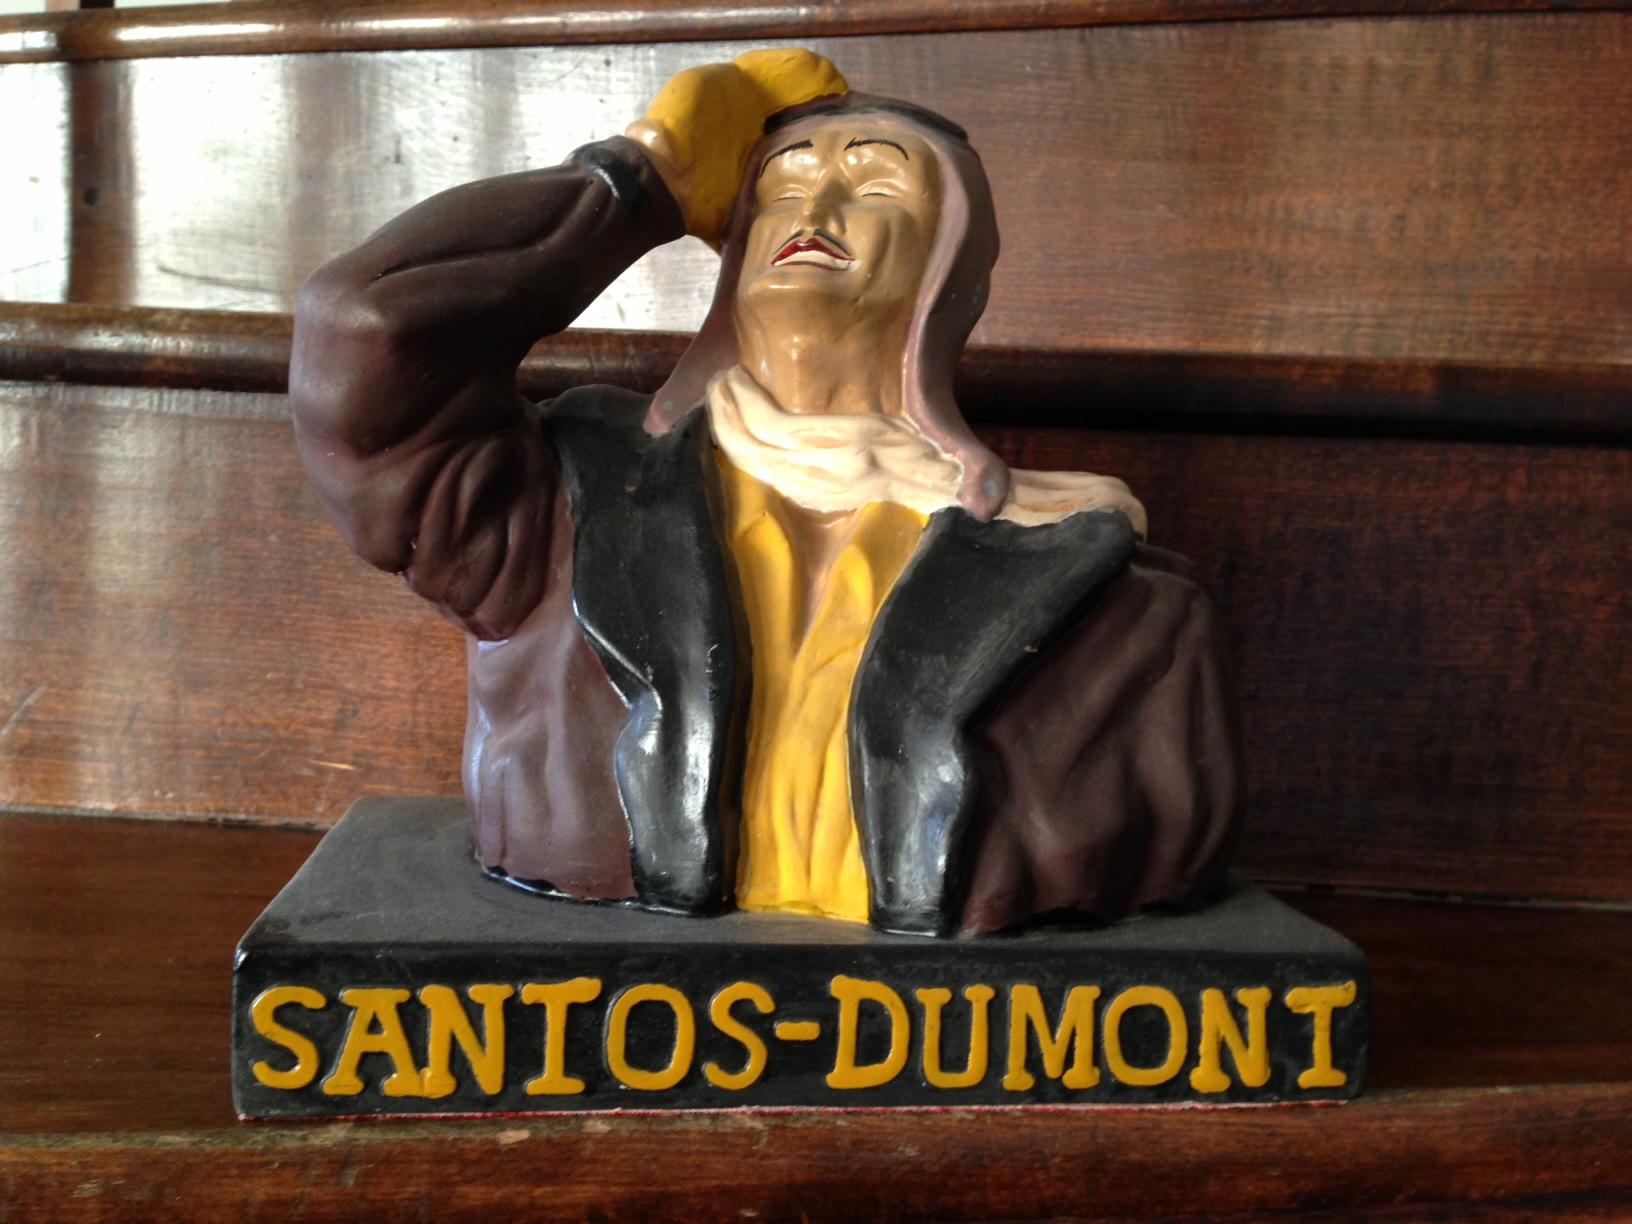 Alberto Santos-Dumont (sculpture)